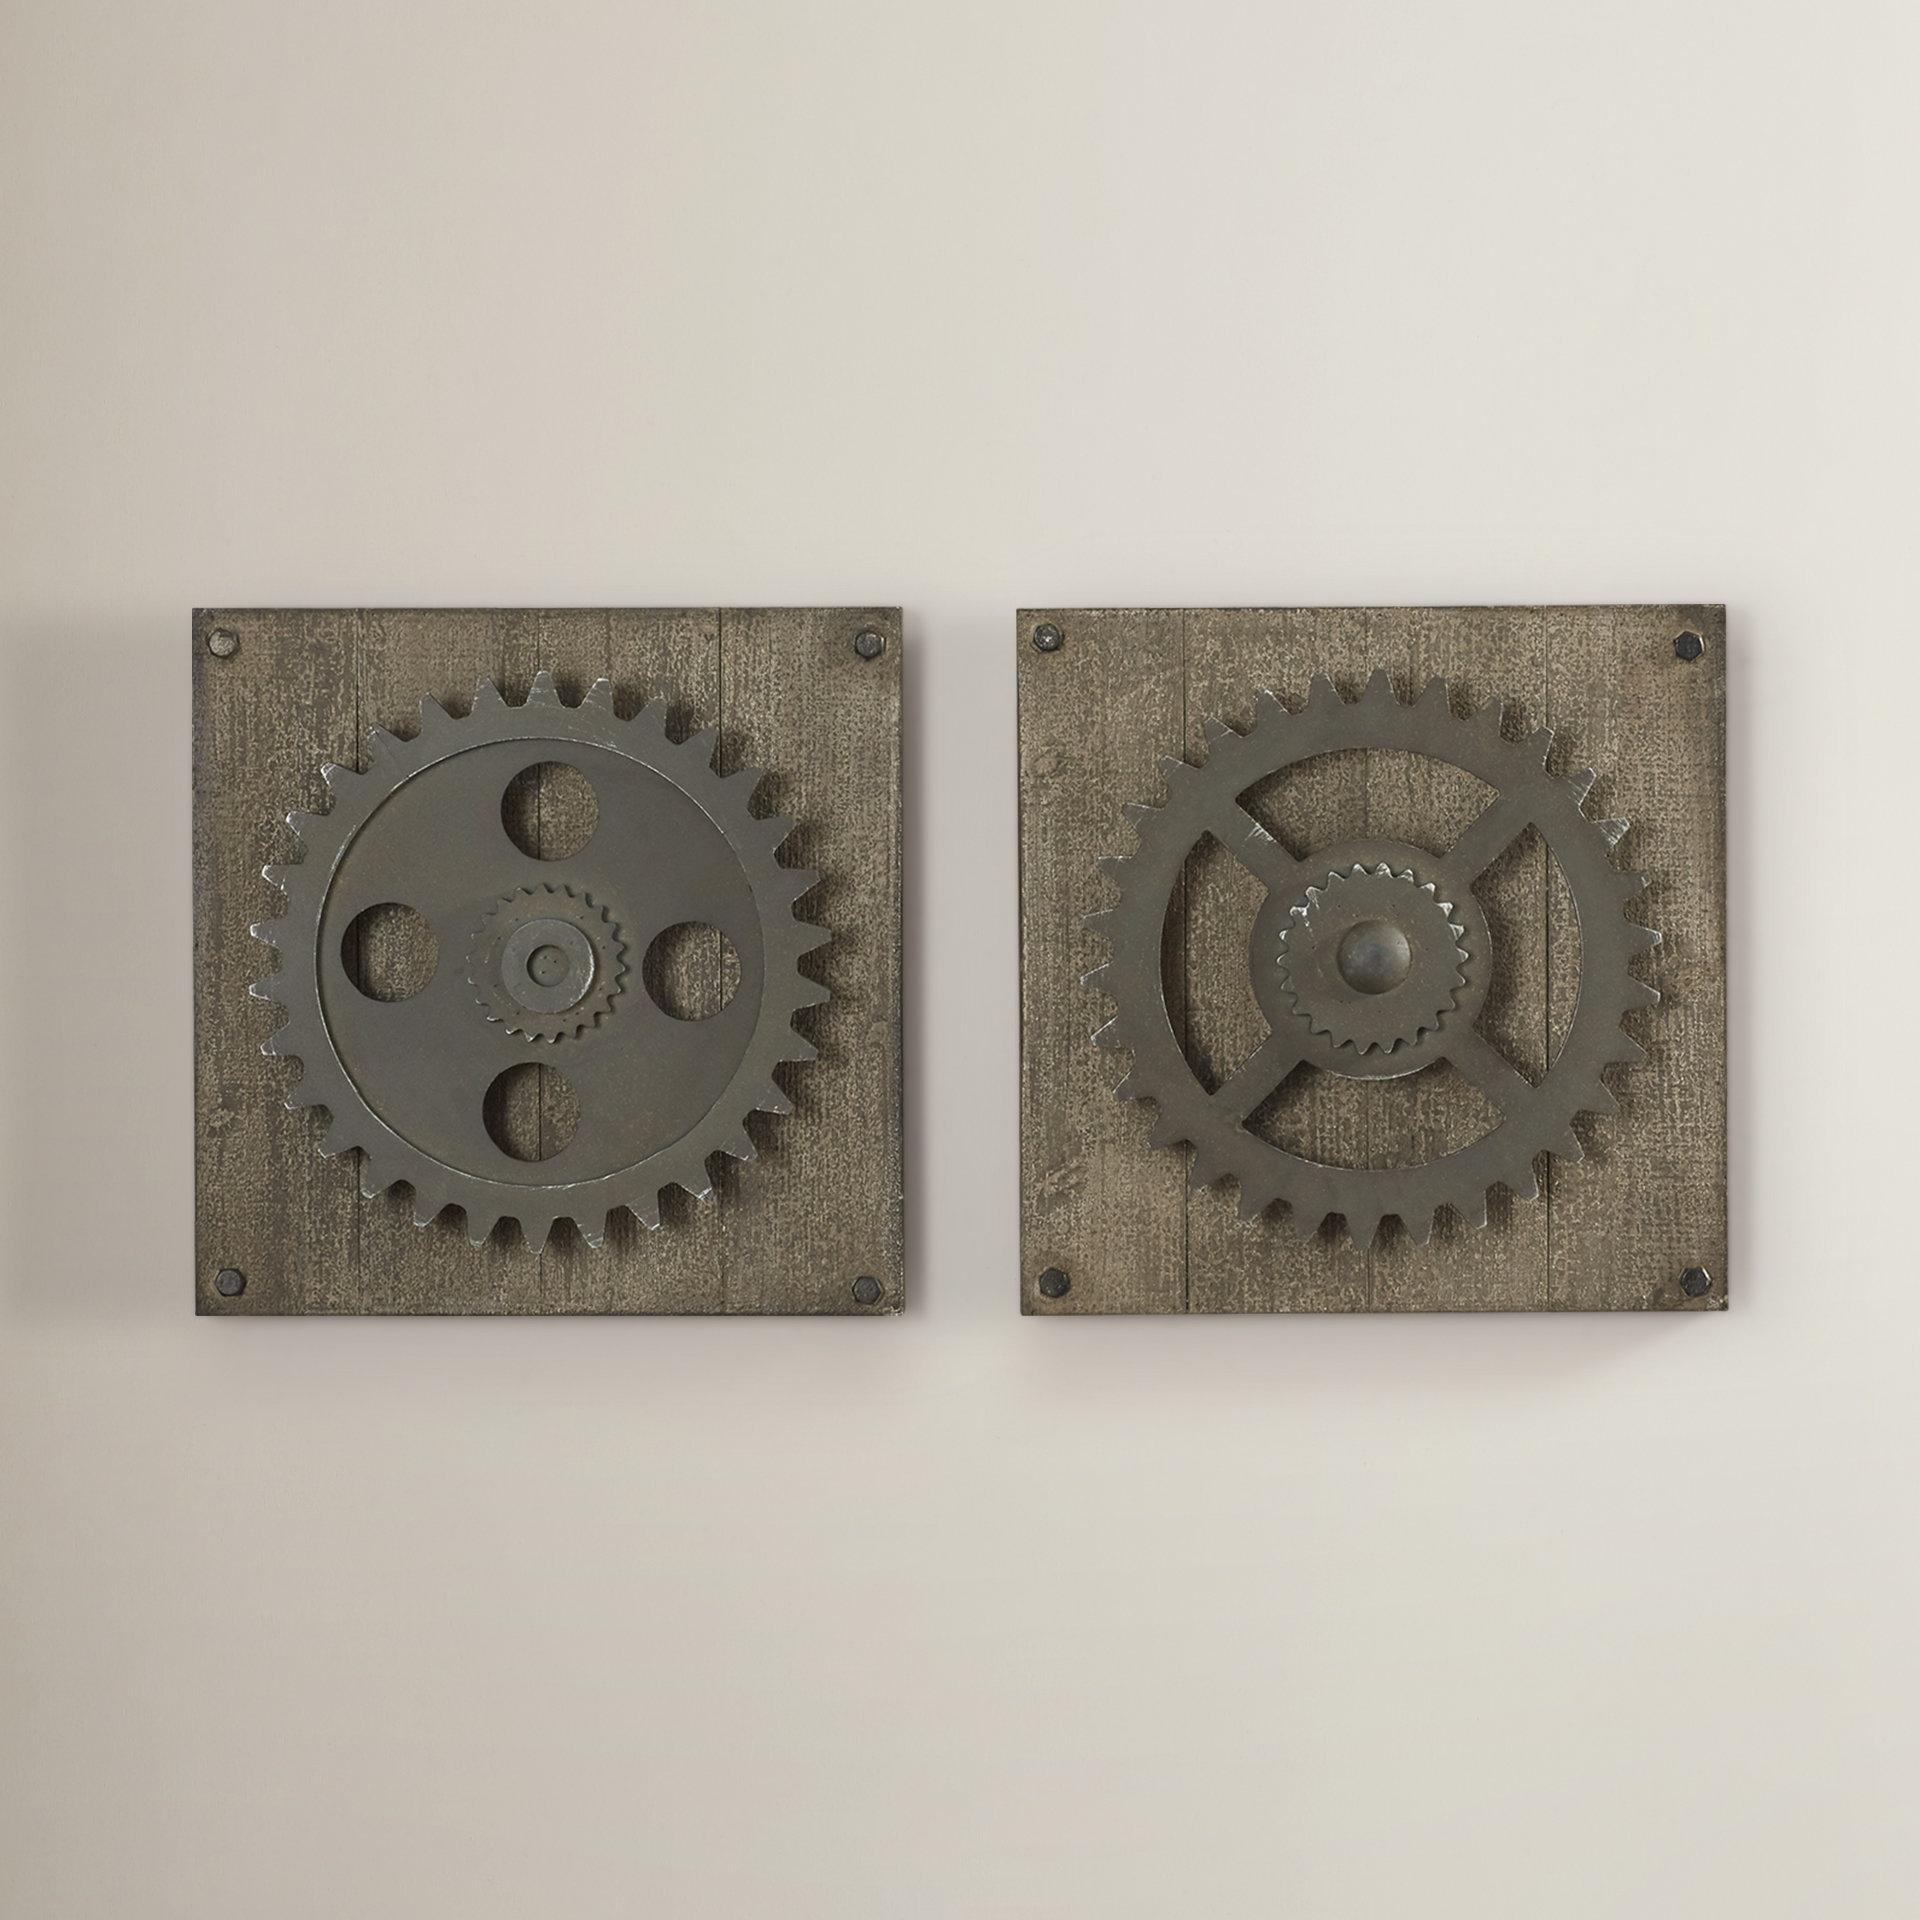 Bike Wheel Wall Decor | Wayfair regarding 4 Piece Handwoven Wheel Wall Decor Sets (Image 7 of 30)